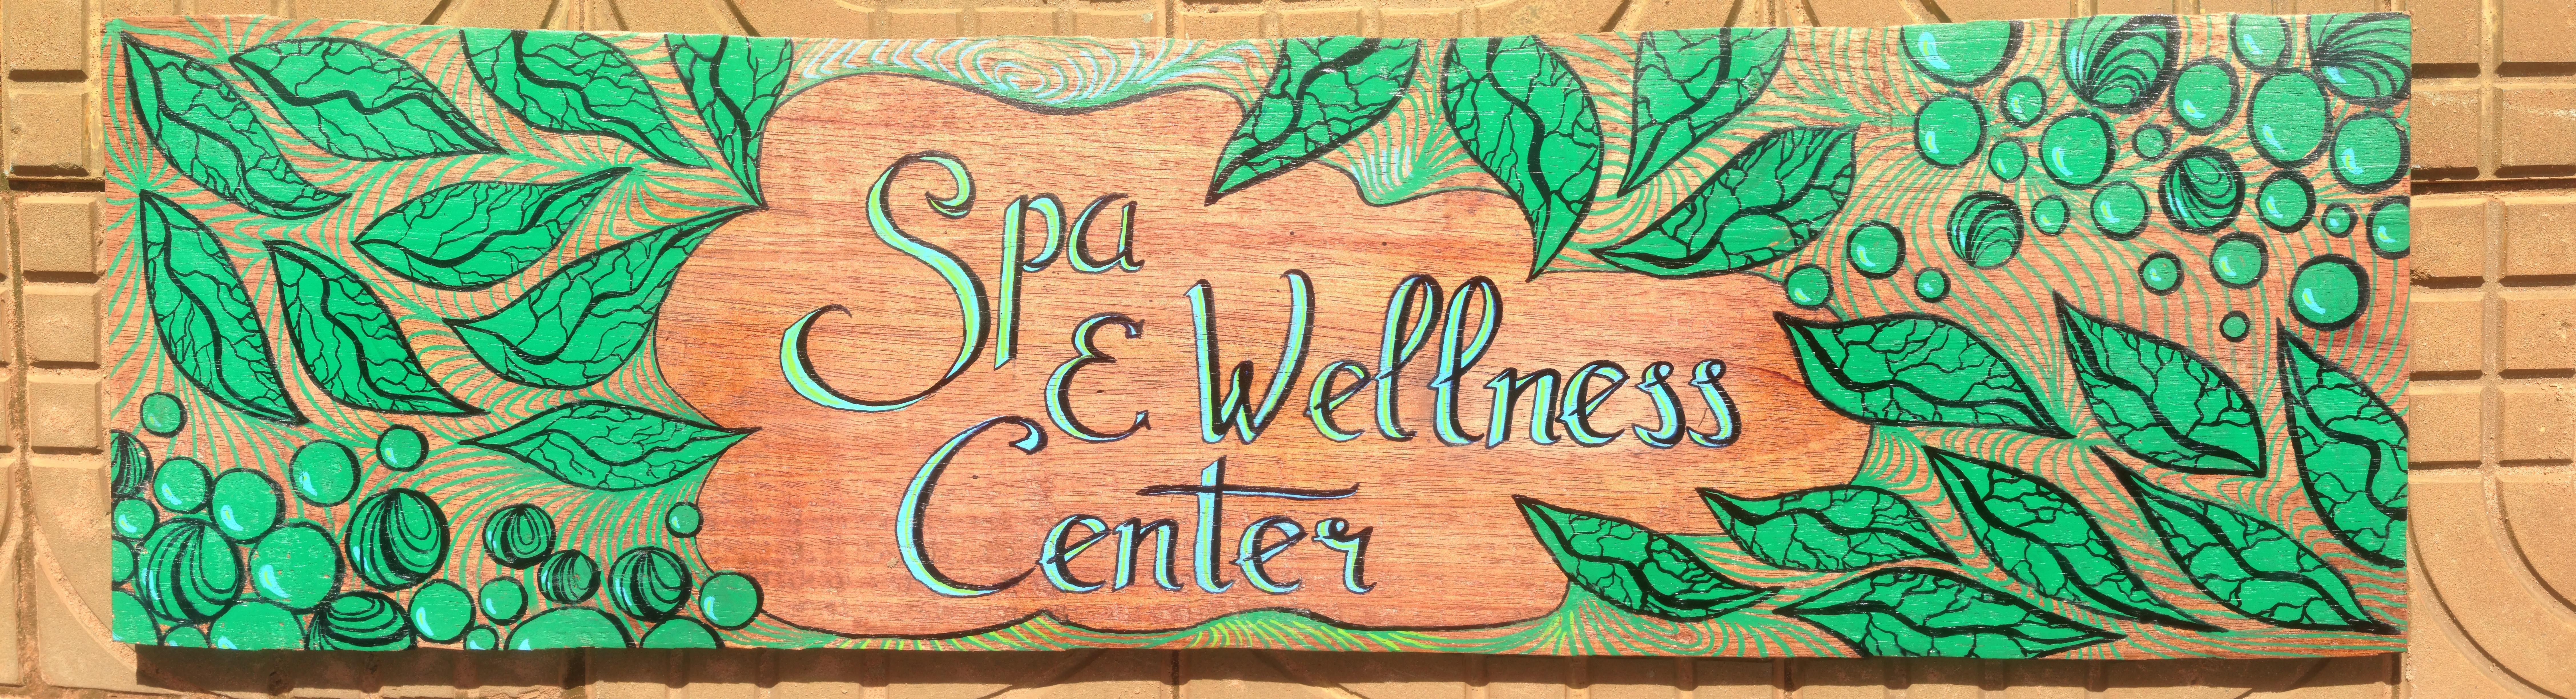 Sign painting hariharalaya yoga meditation retreat center spa welness